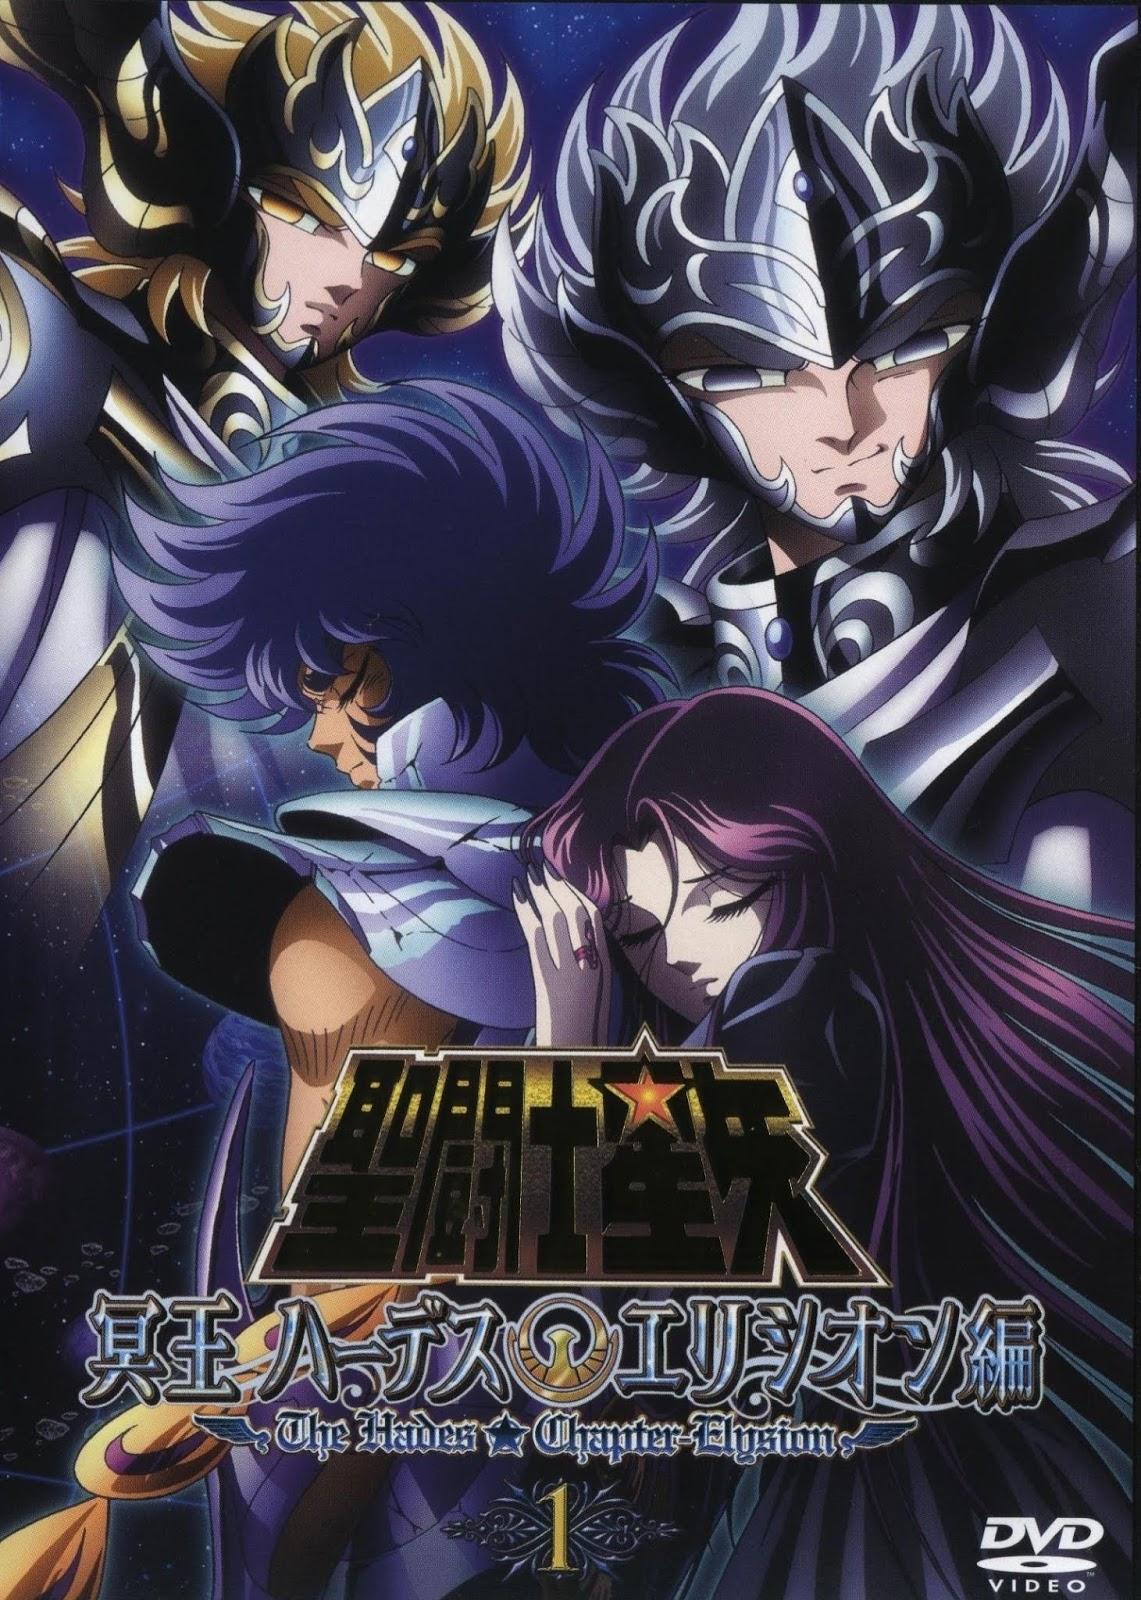 Saint Seiya: The Hades Chapter [2002] [DVDR] [NTSC] [Latino] [11 DISC]